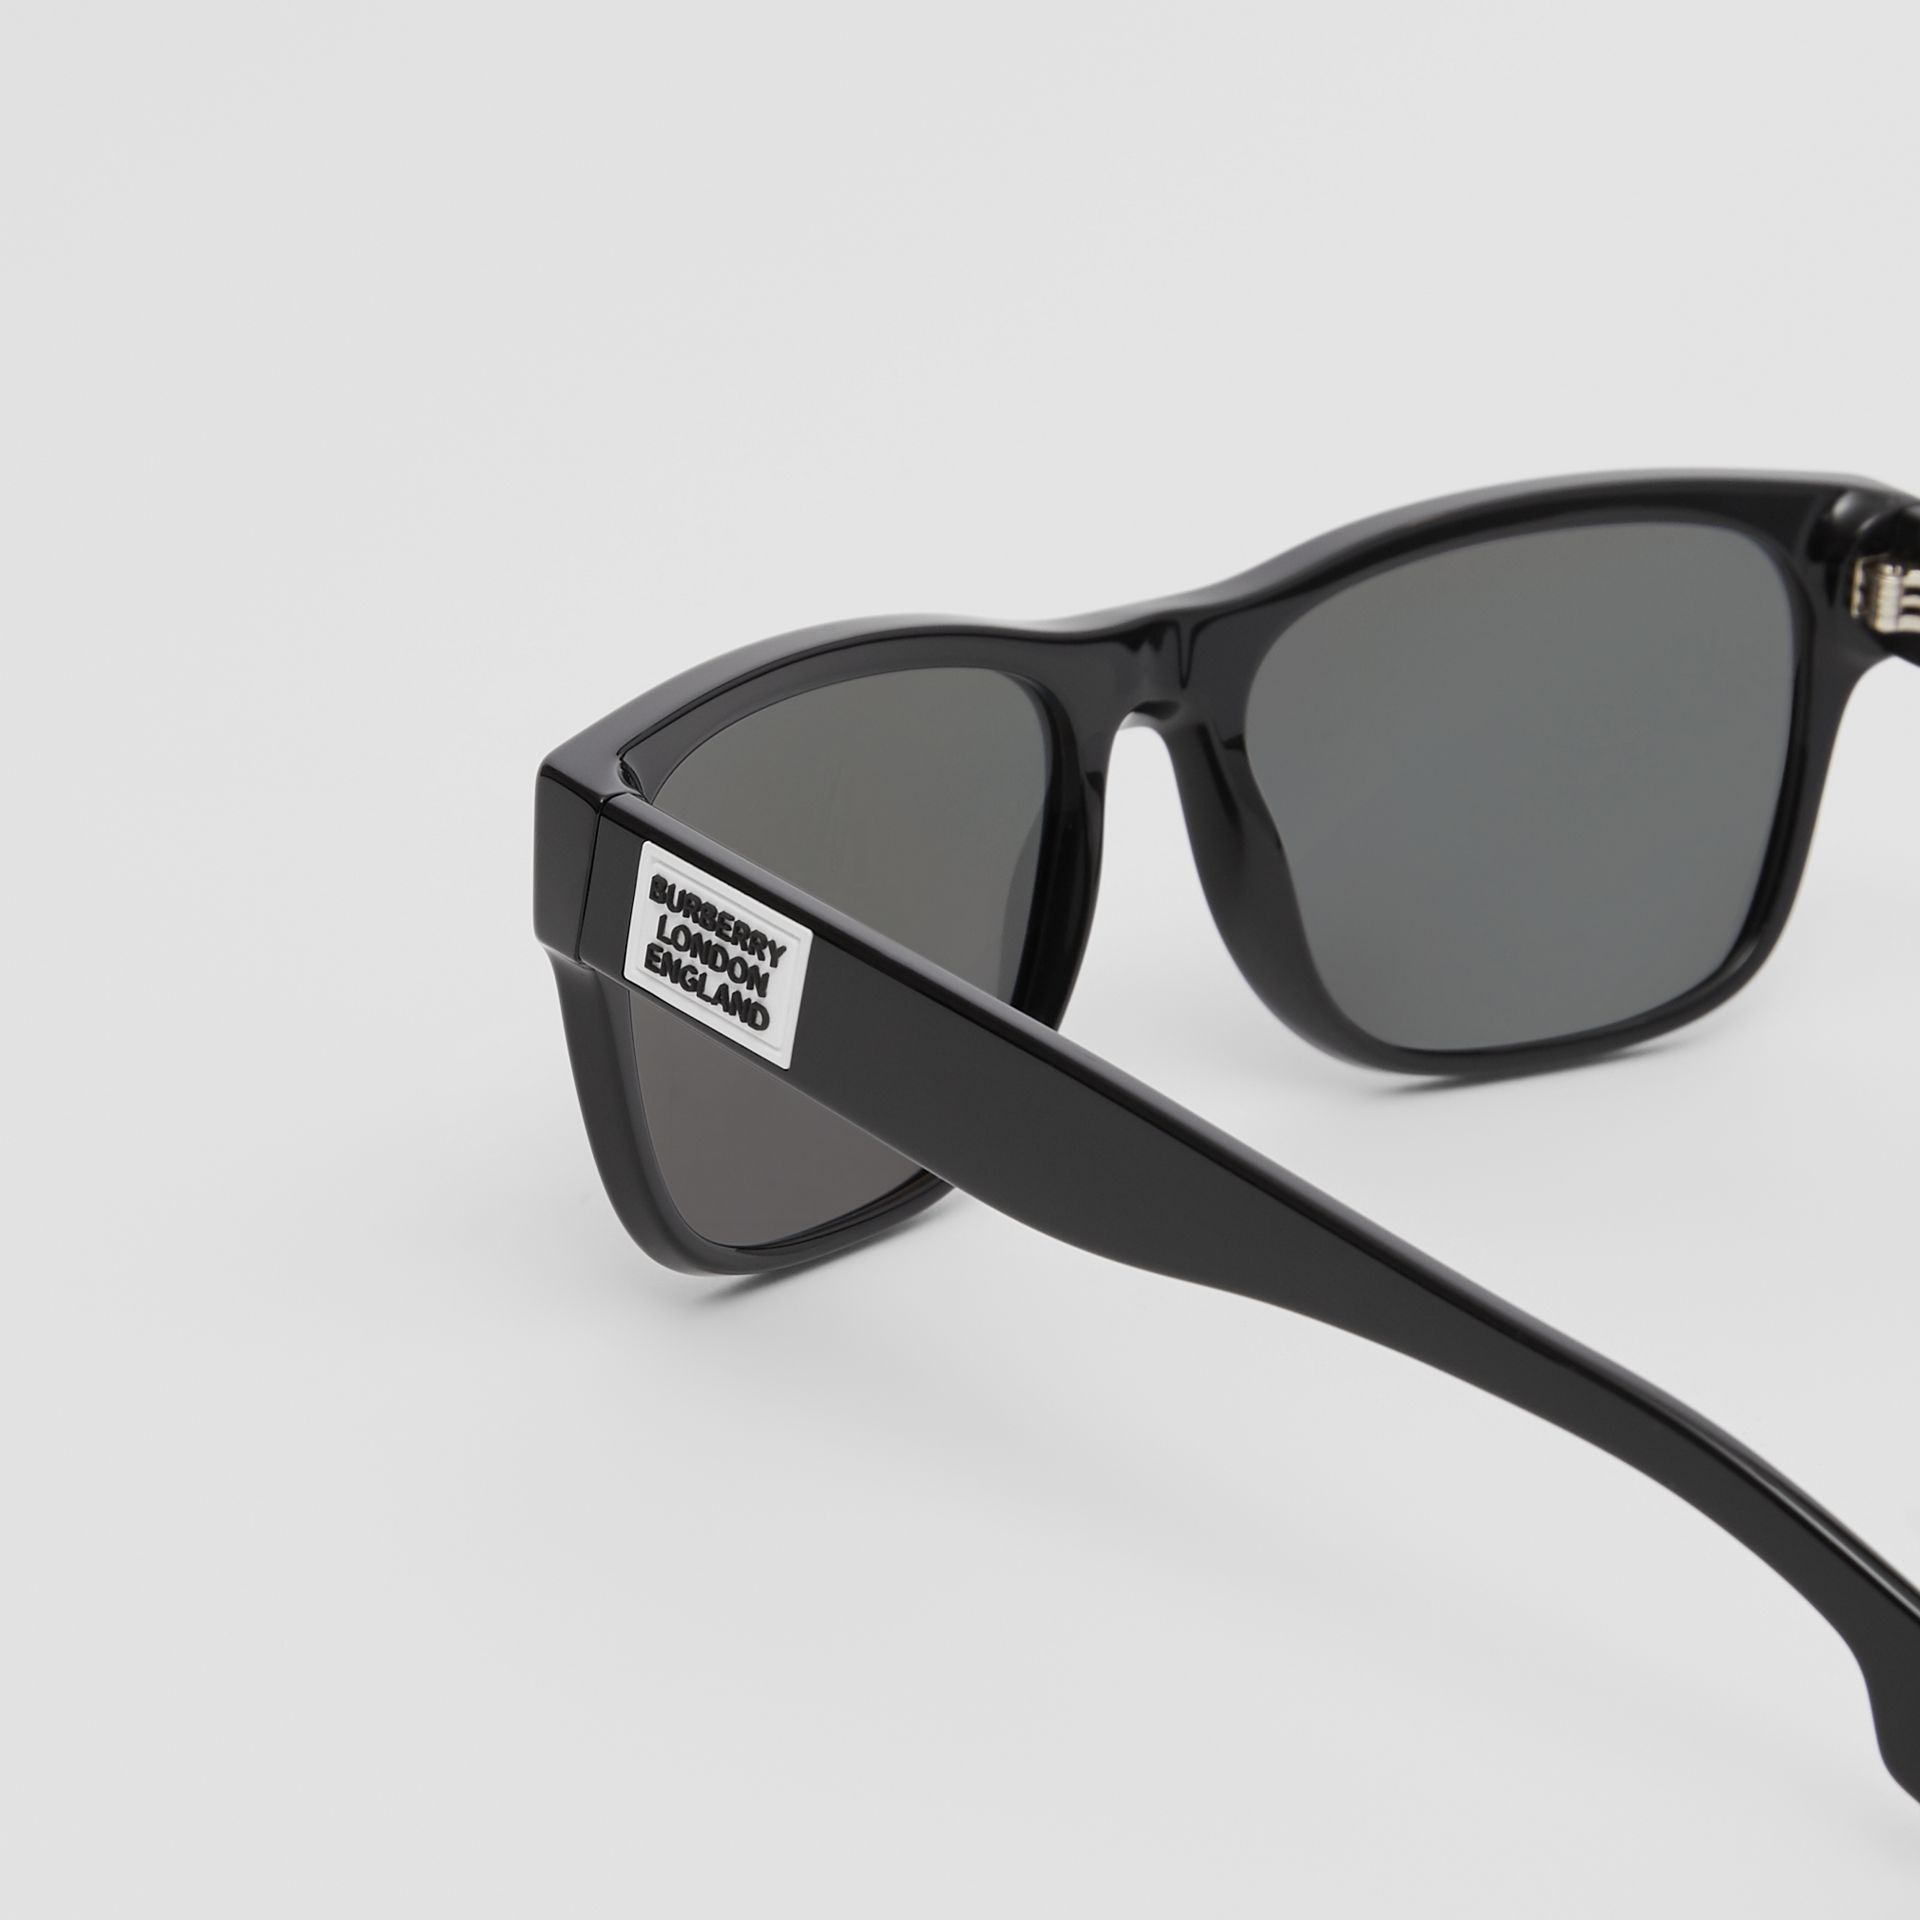 Logo Appliqué Square Frame Sunglasses in Black - Men | Burberry - gallery image 1